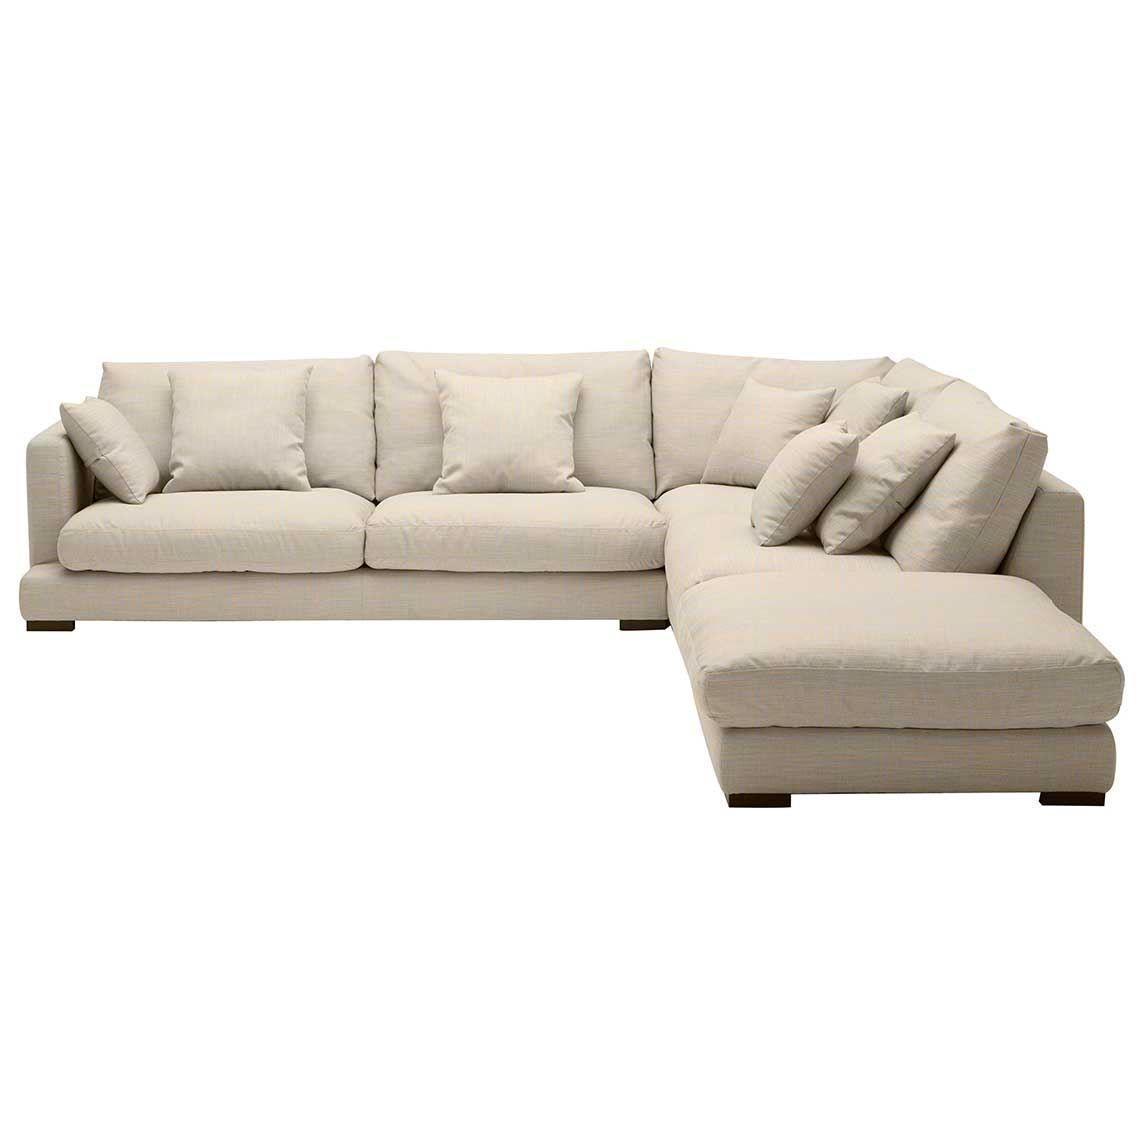 Hamilton 5 Seat Fabric Corner Modular Sofa And Ottoman Natural in ...